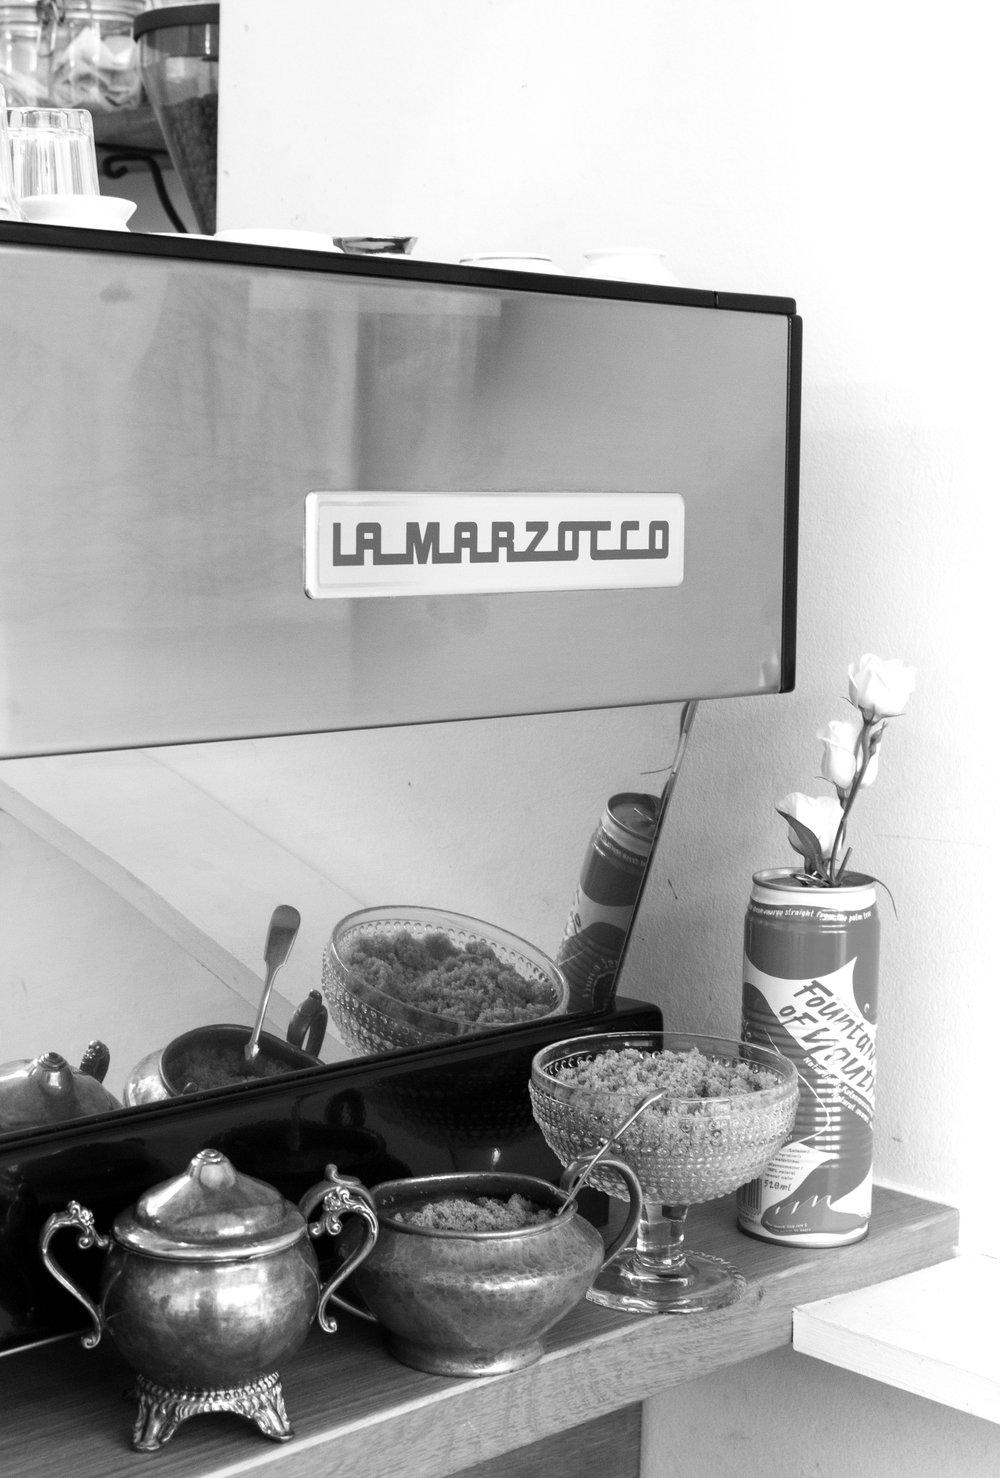 Lamazocco.jpg